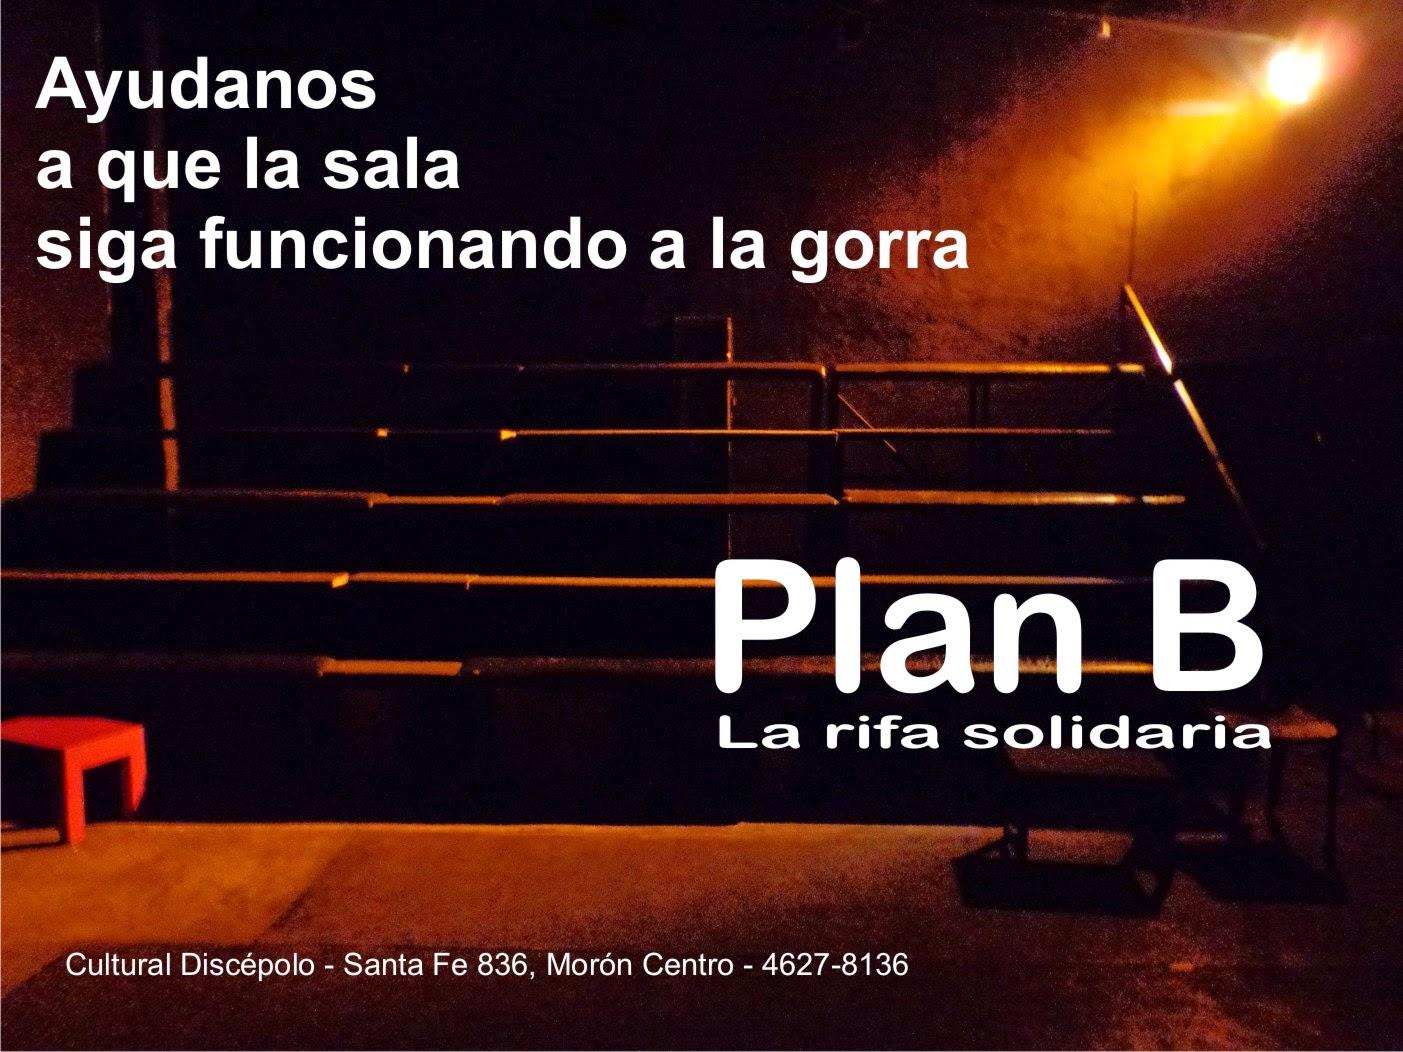 http://culturaldiscepolo.blogspot.com.ar/p/plan-b-2014-la-sala-de-teatro.html